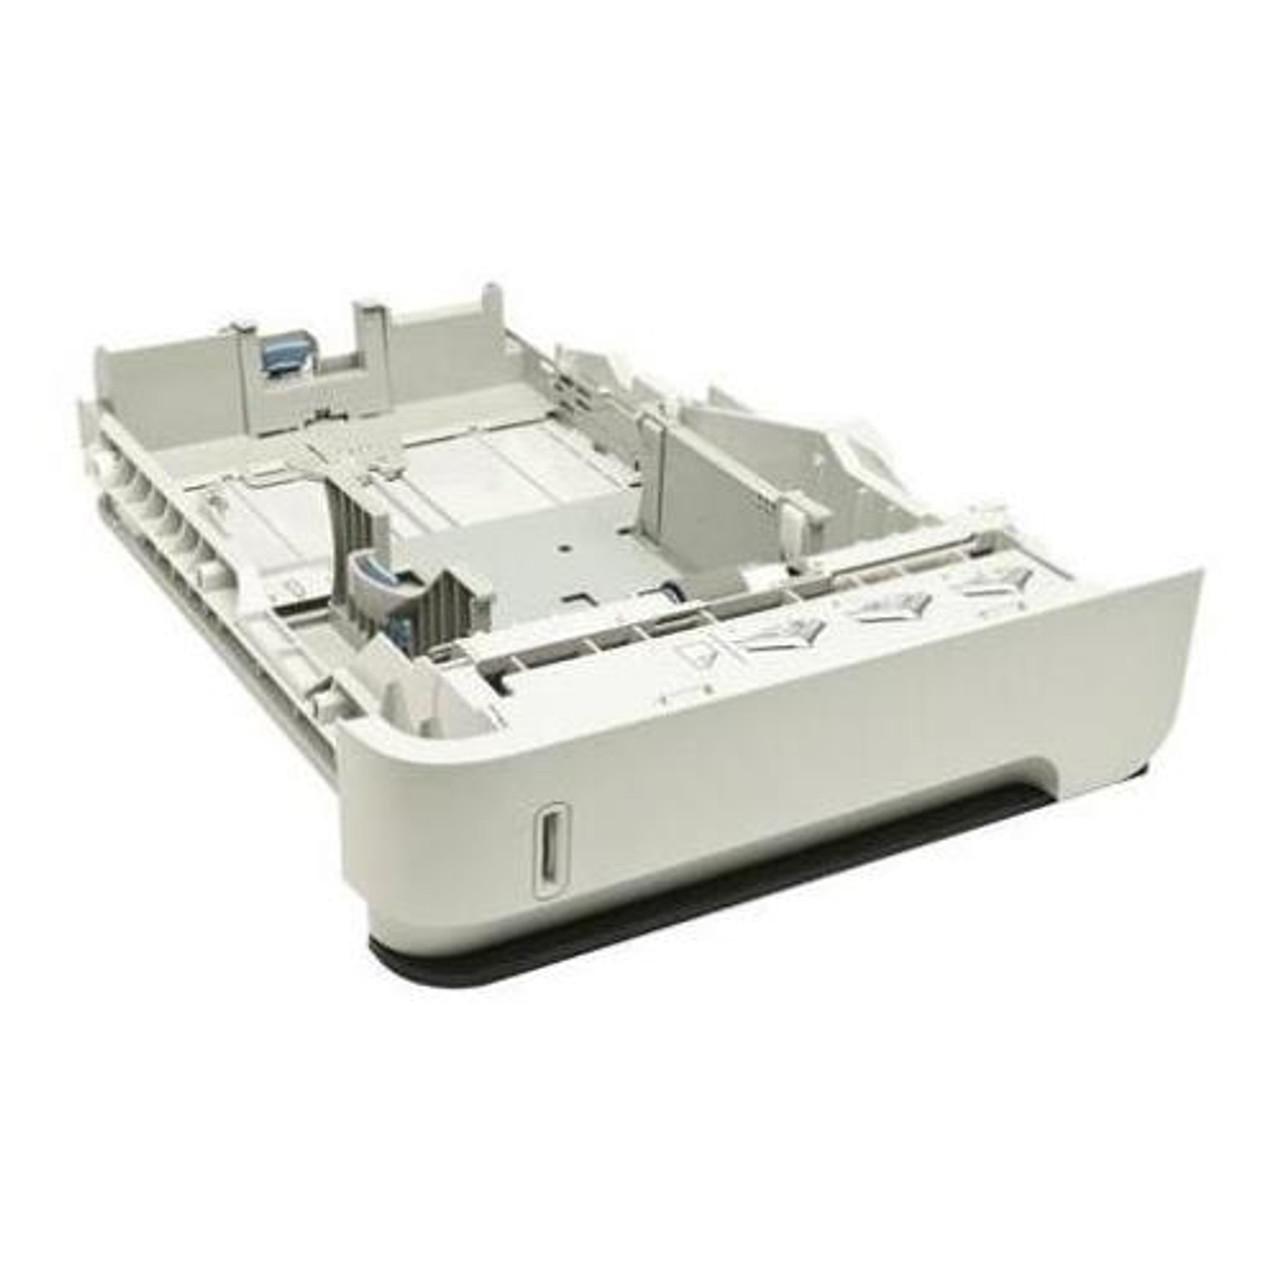 500 Sheet Feeder CB518A HP LaserJet P4014//P4015//P4510 Series